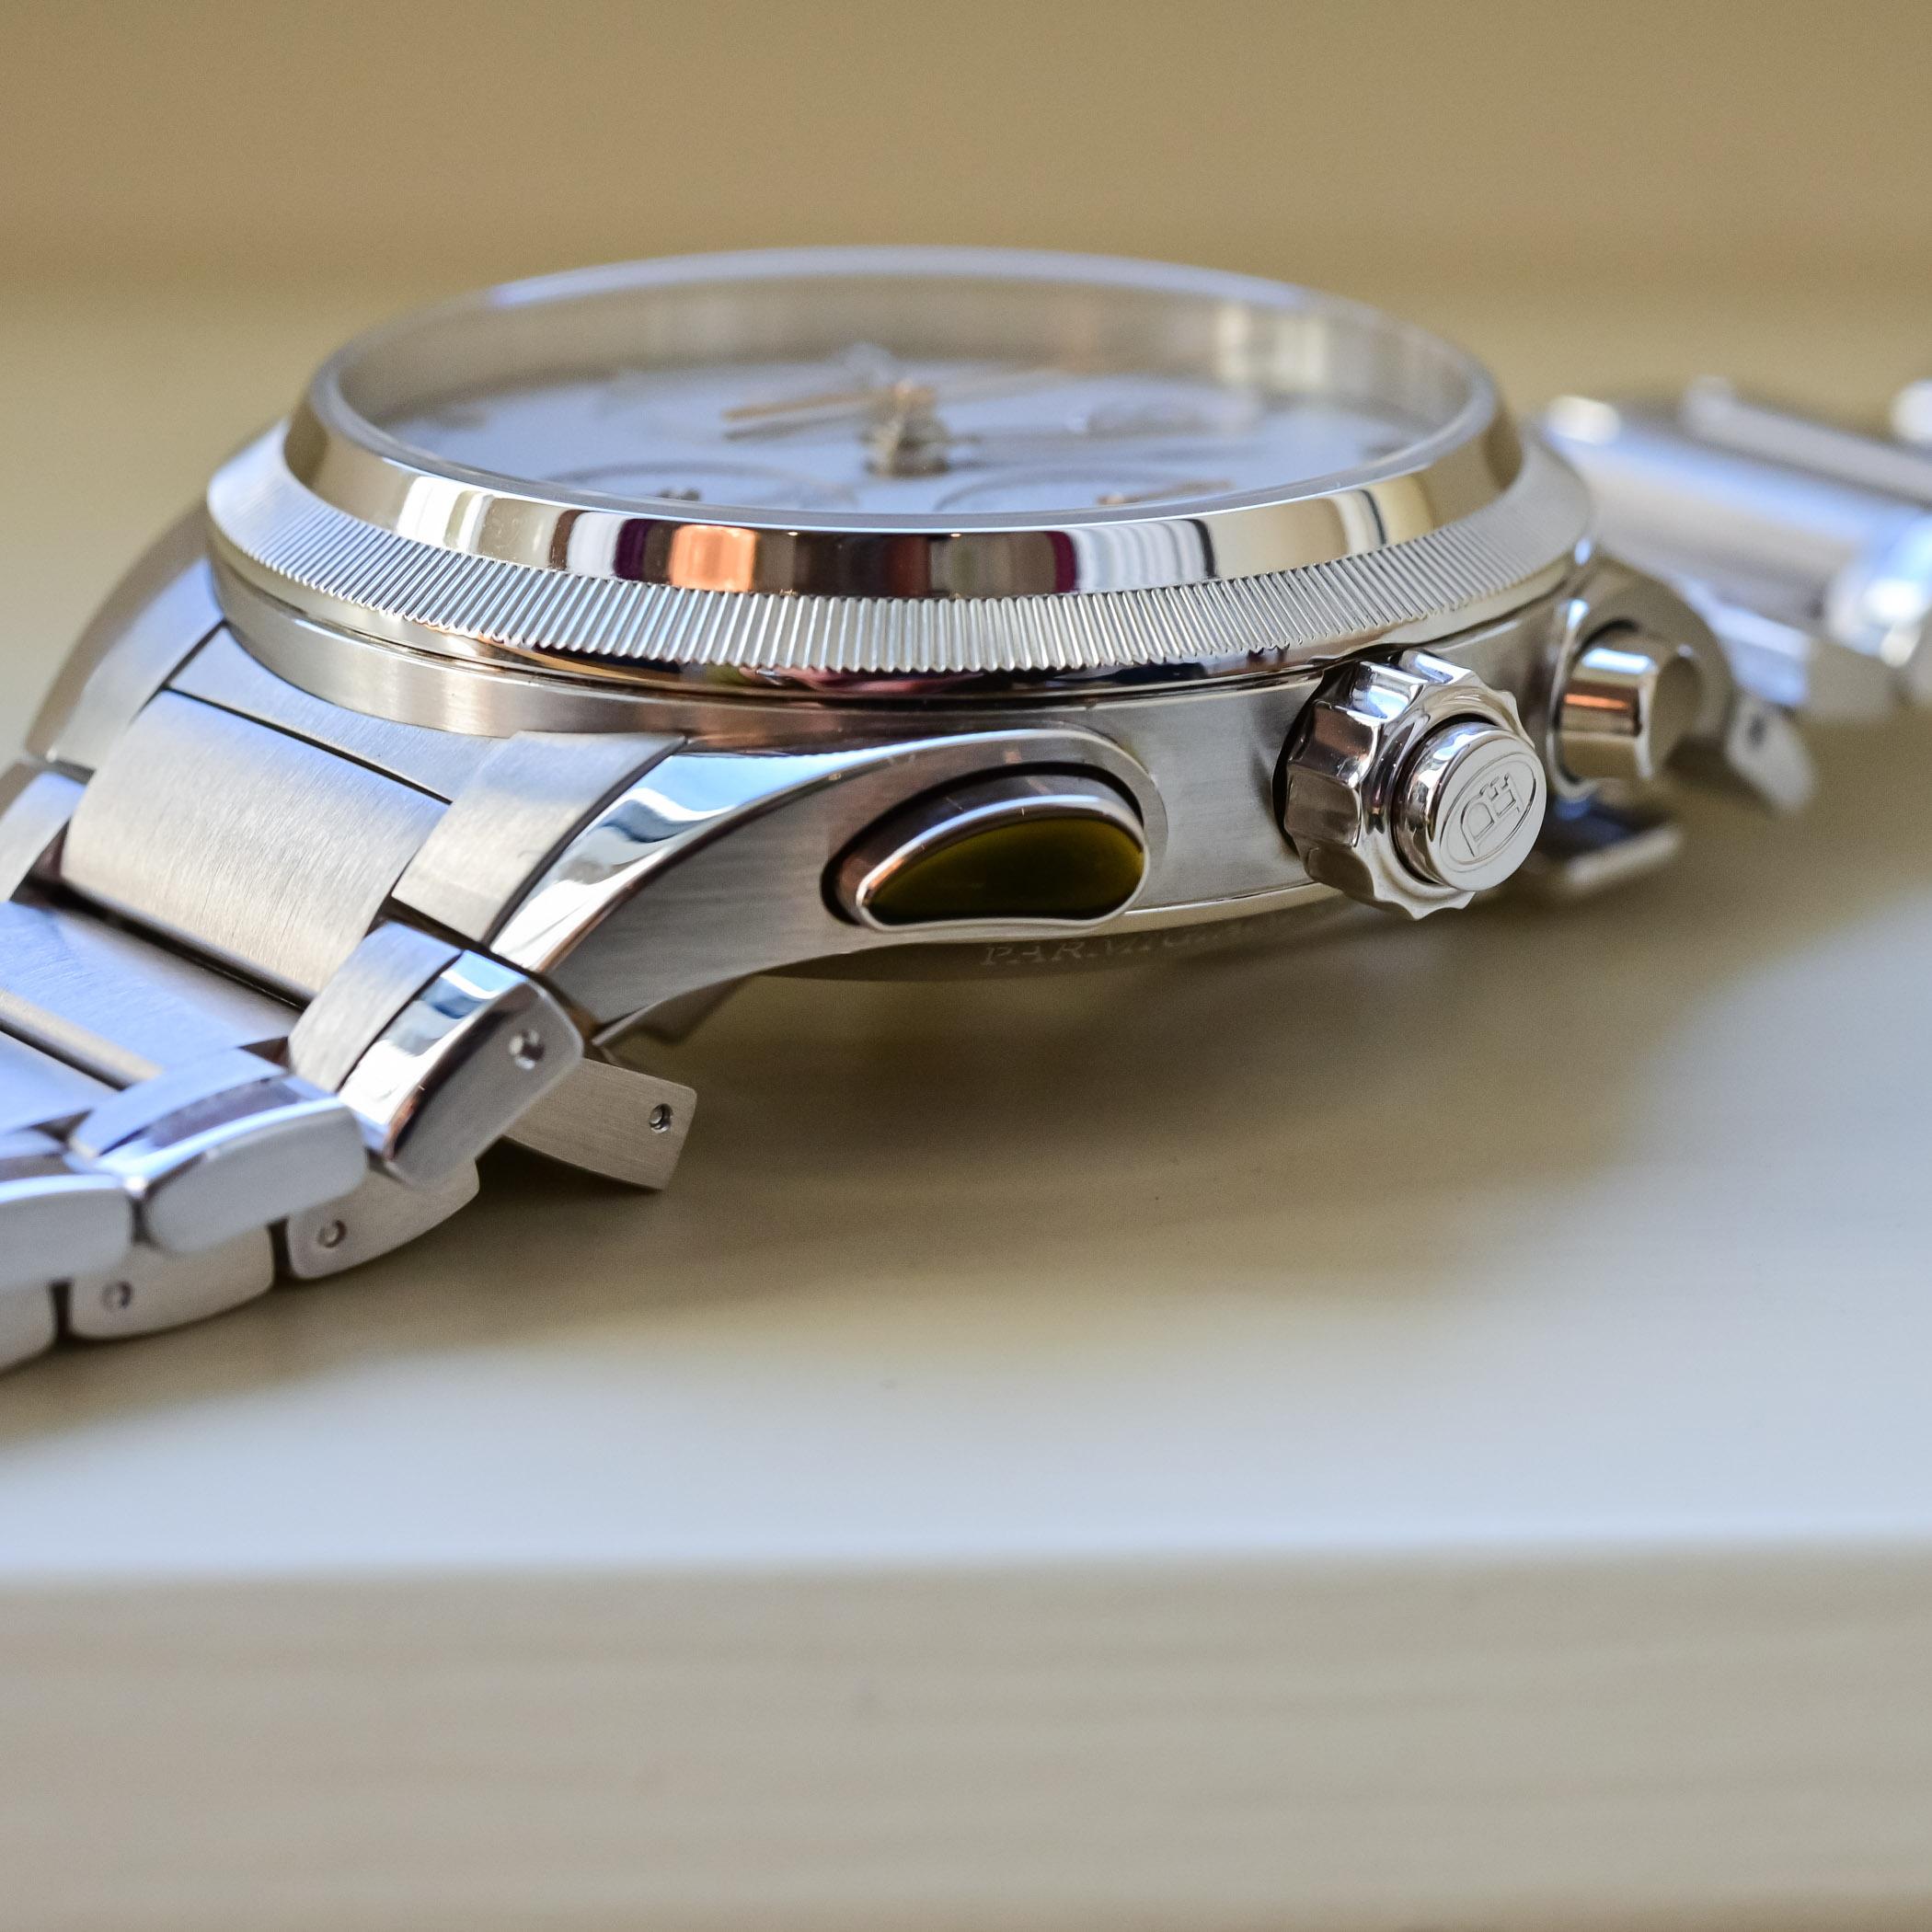 Parmigiani Fleurier Tonda PF Split Seconds Chronograph Platinum Chrono Movement PFH916-2010001-200182 - review - 13